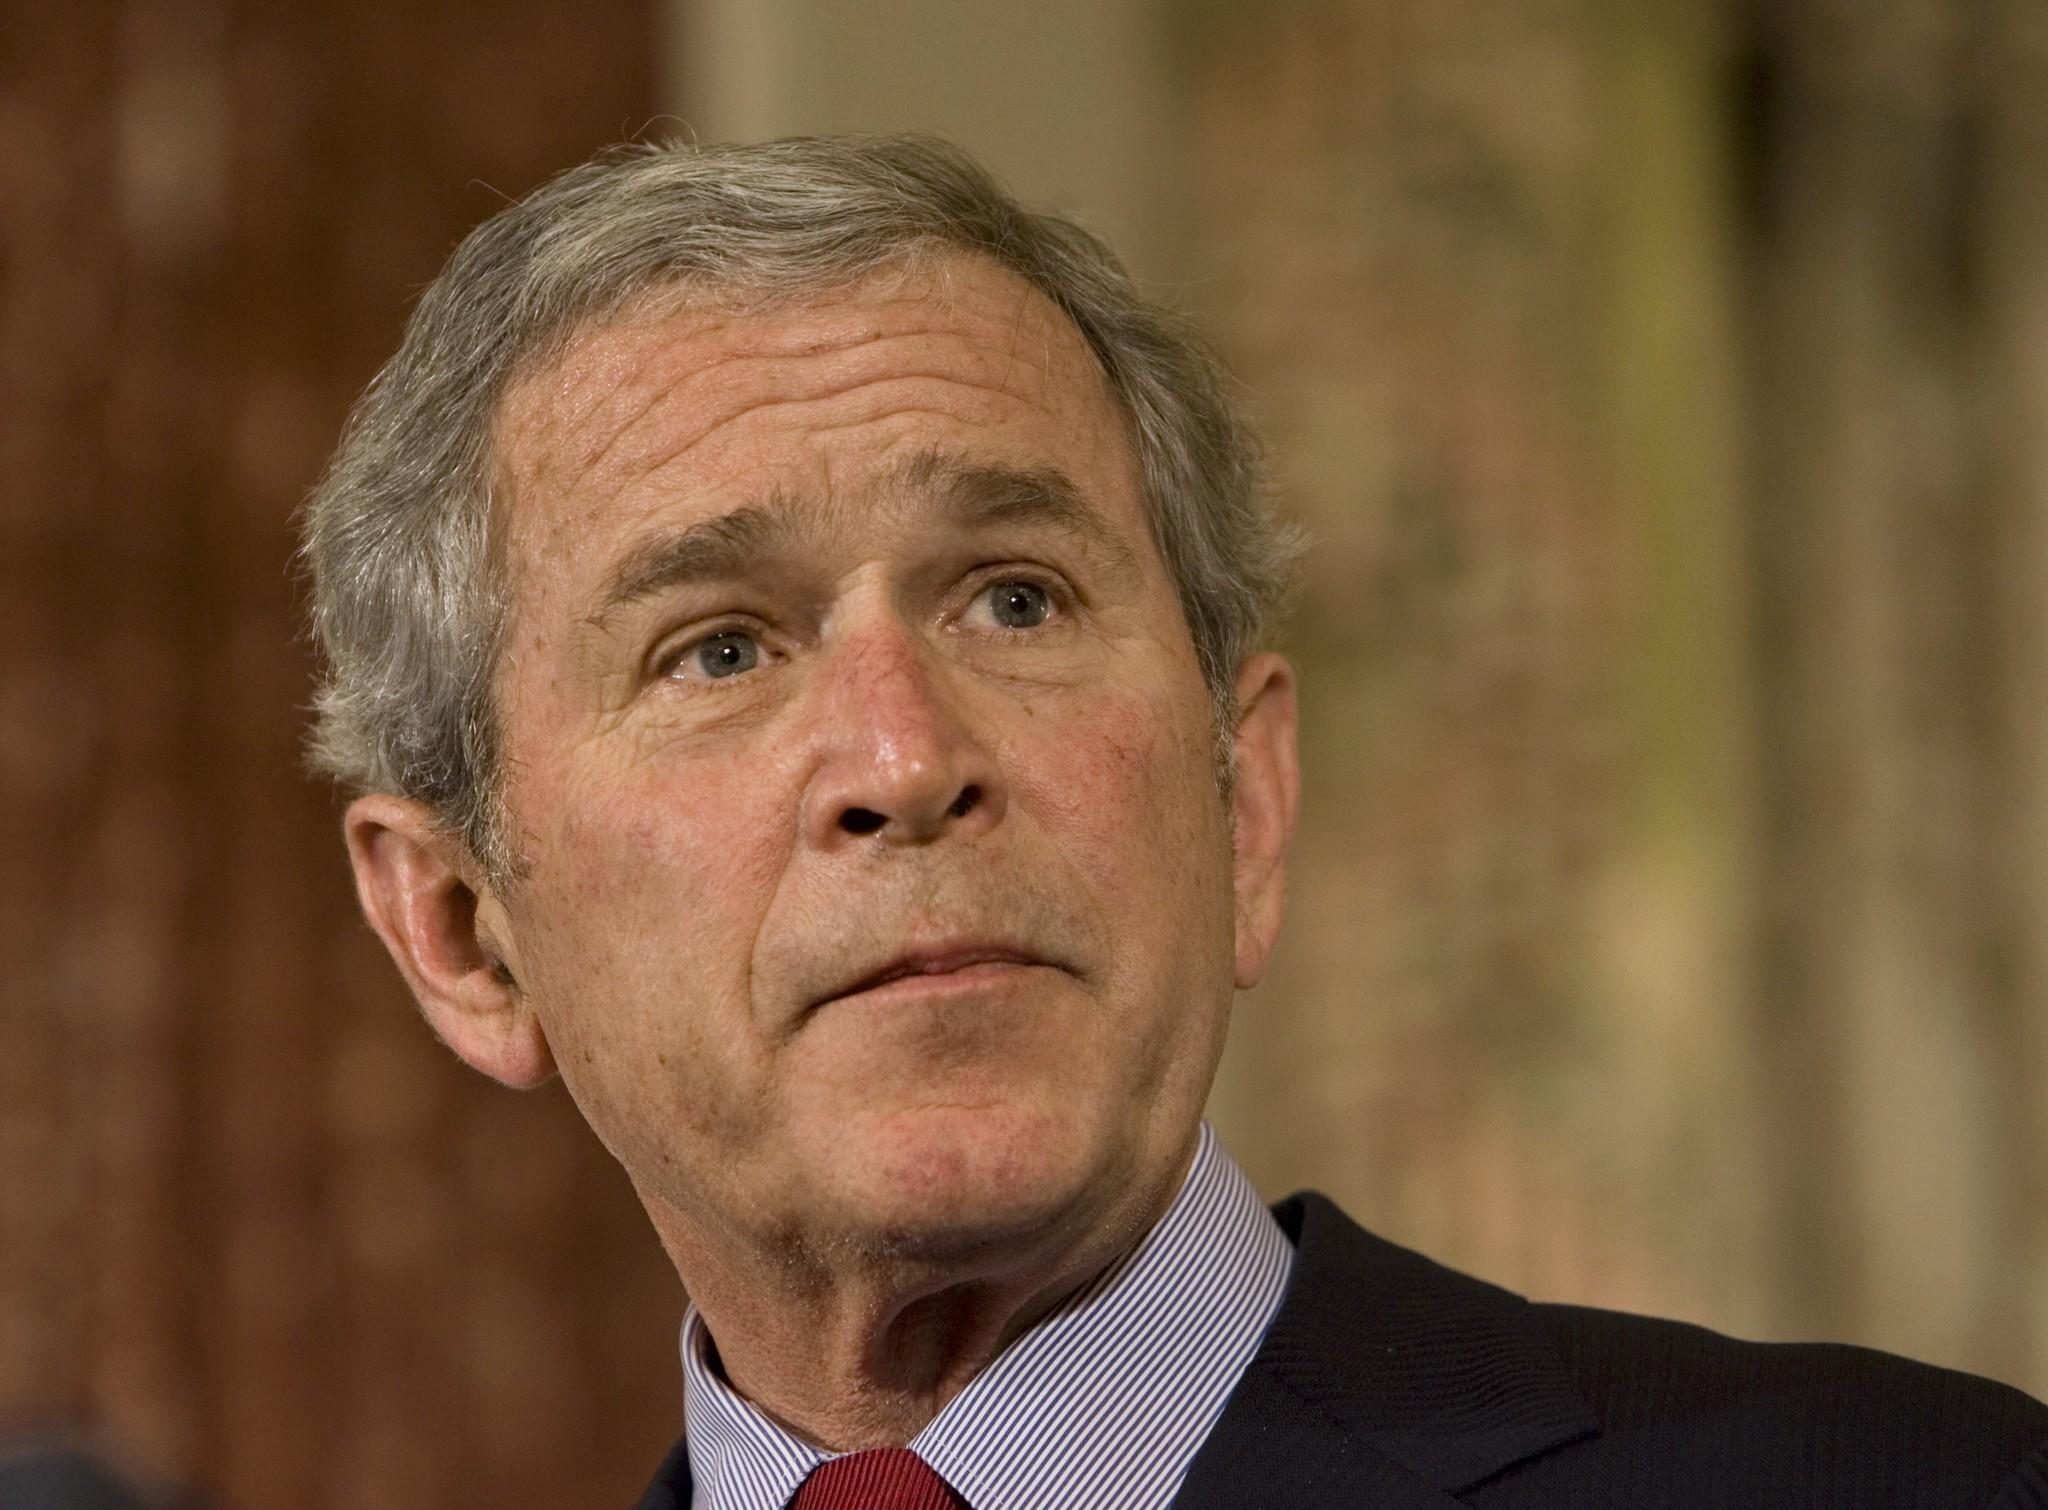 It S Not Too Soon To Judge George W Bush S Presidency On